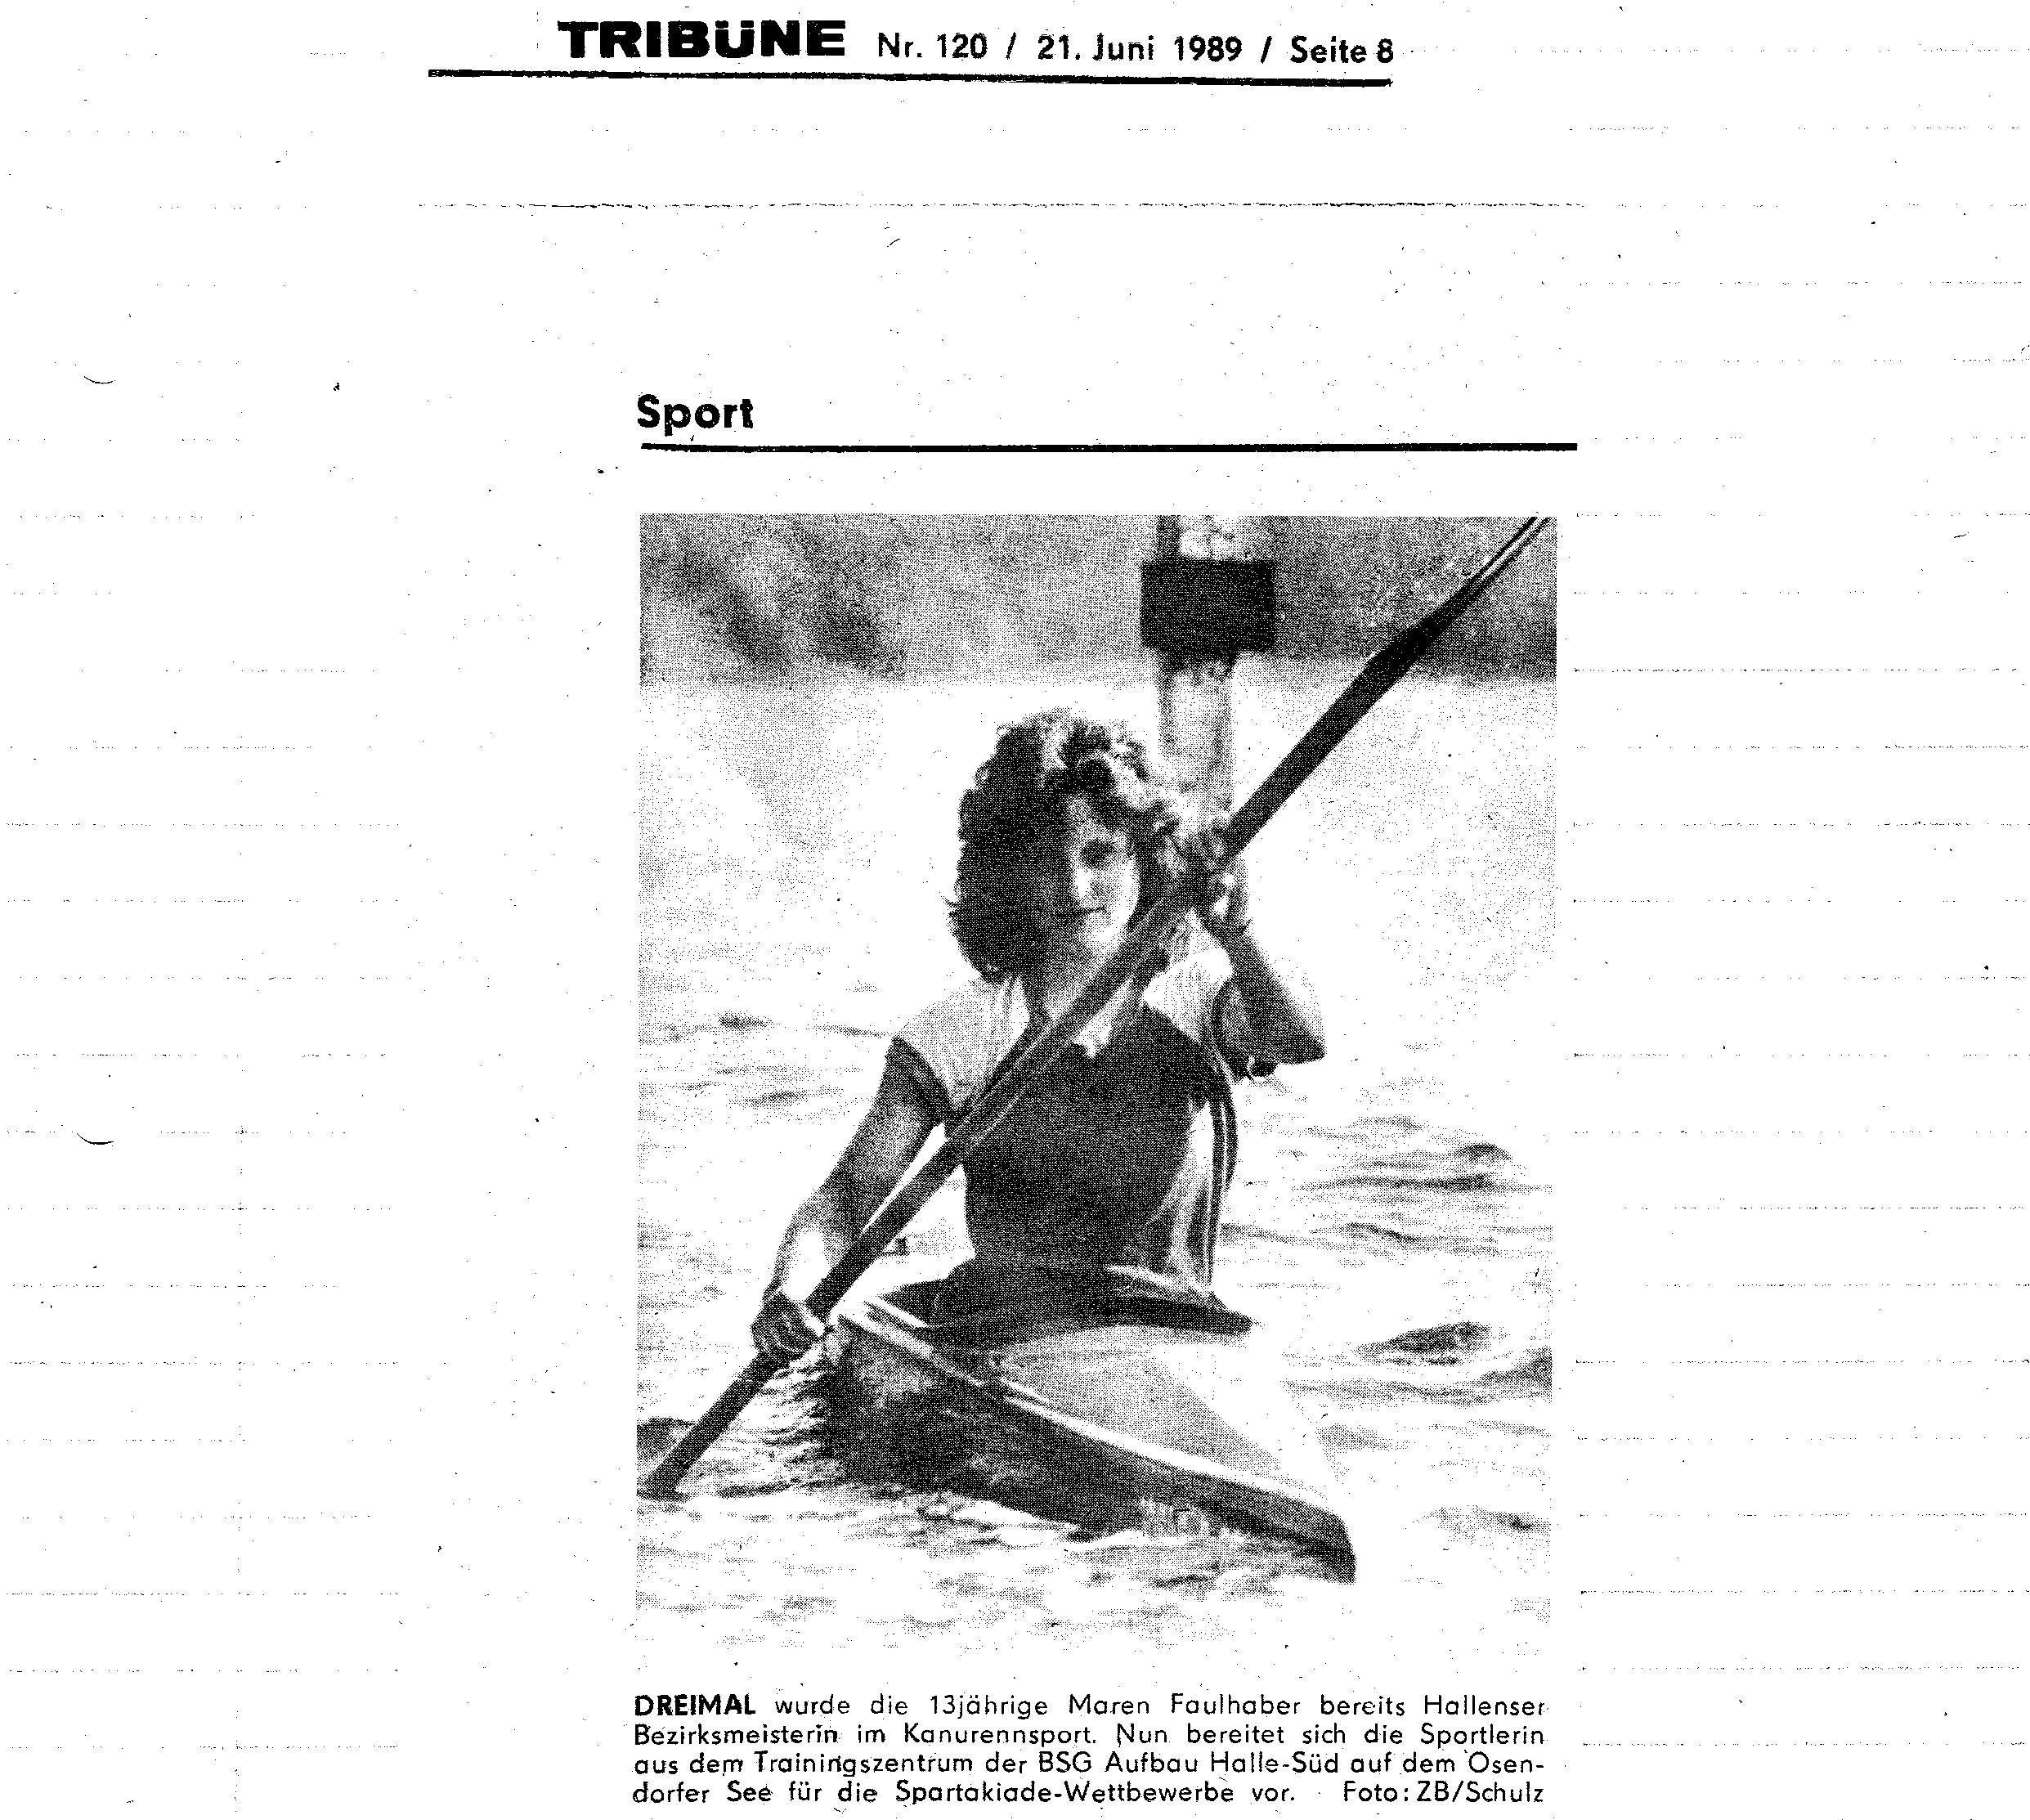 1989-06-21 Maren Faulhaber